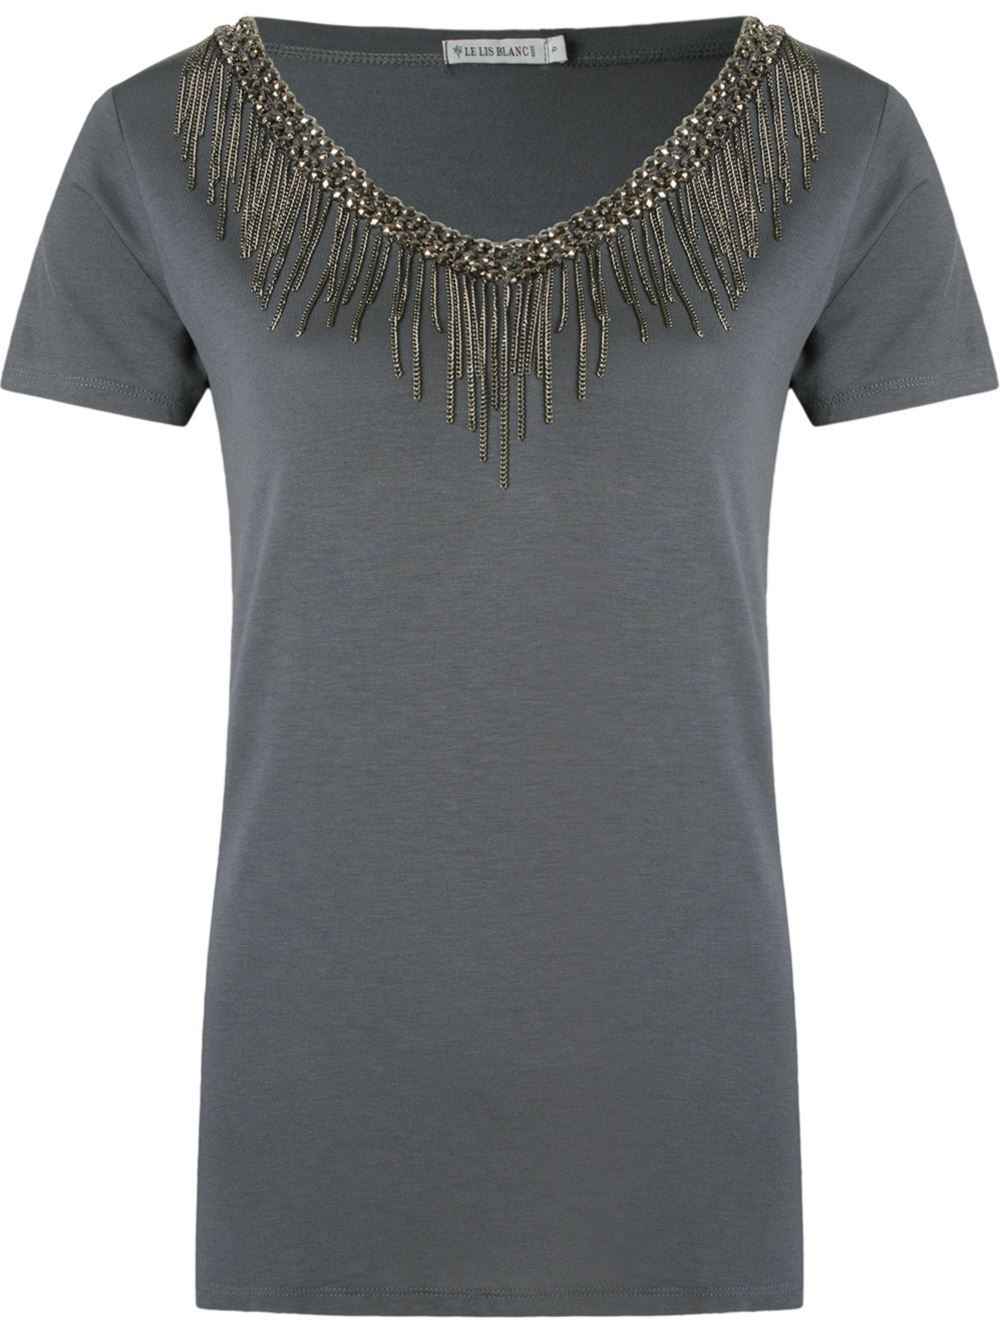 49af531a7534 Le Lis Blanc Camiseta com bordado | camiseta | Camisetas bordadas ...